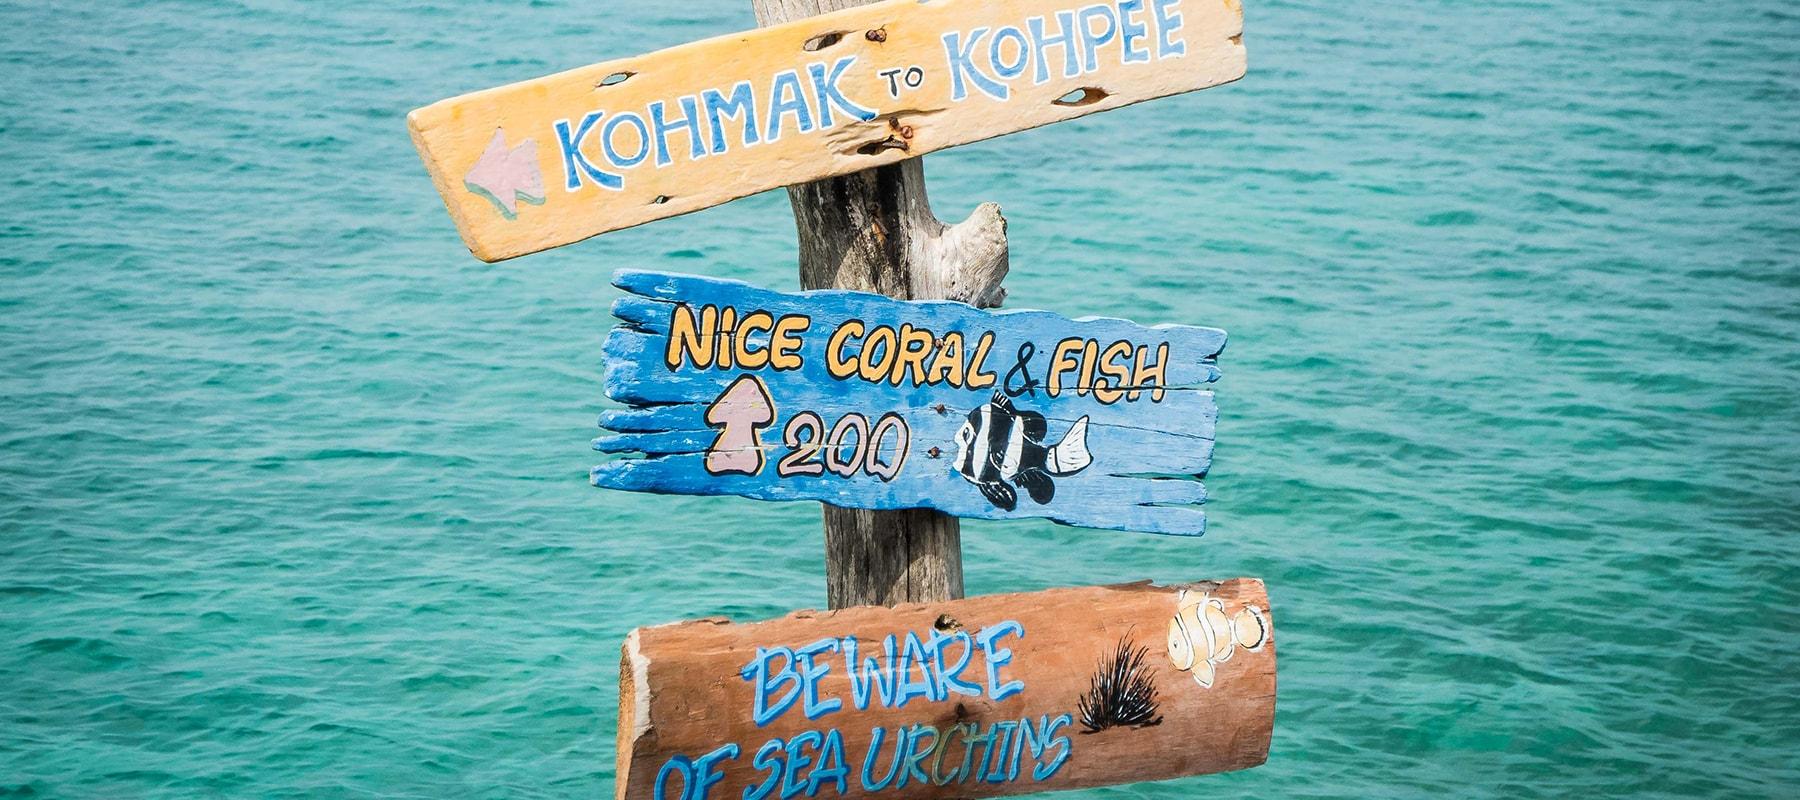 koh-mak-islandhopping